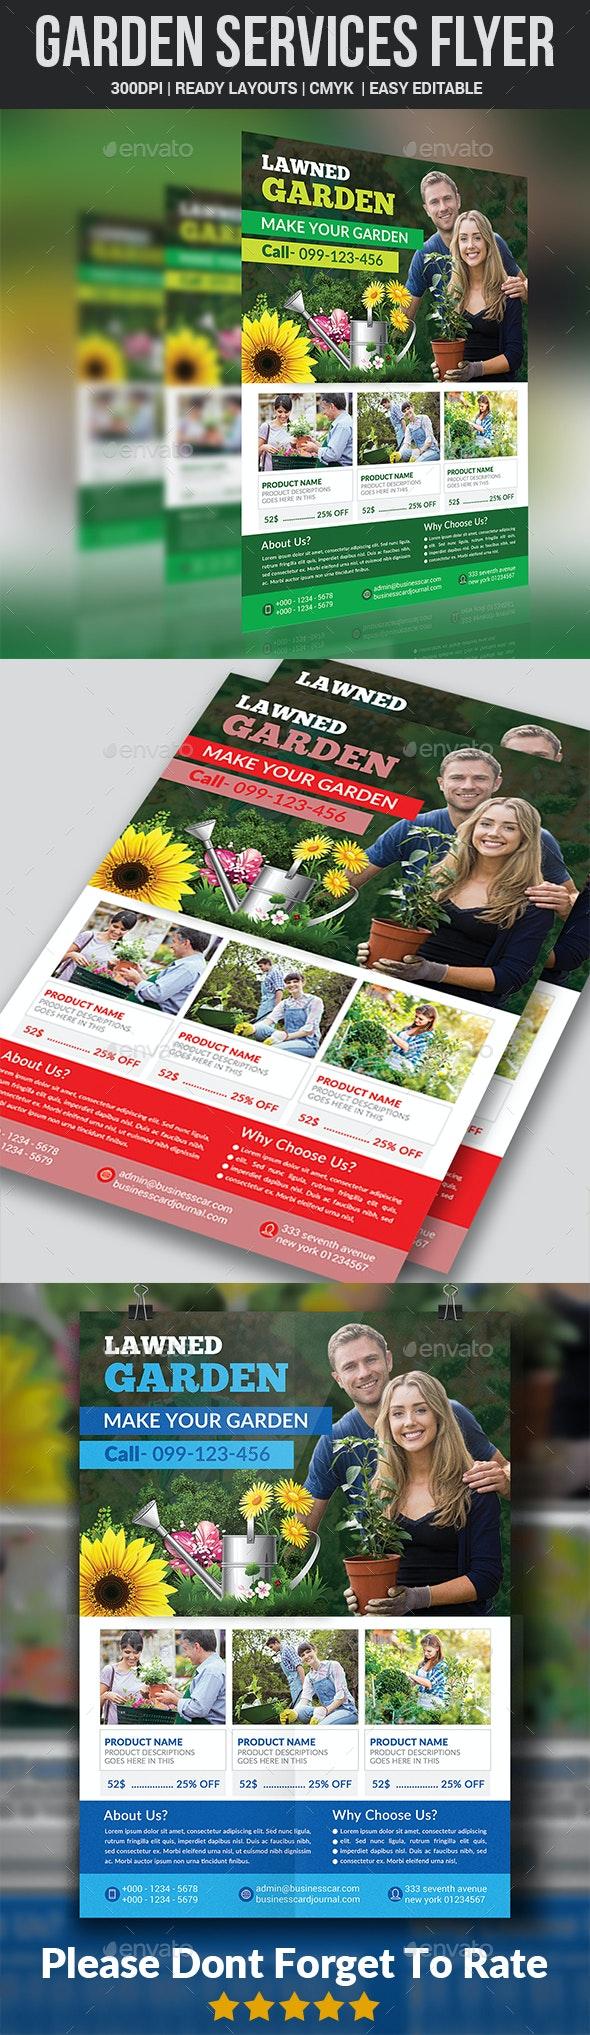 Garden Services Flyer Template - Commerce Flyers